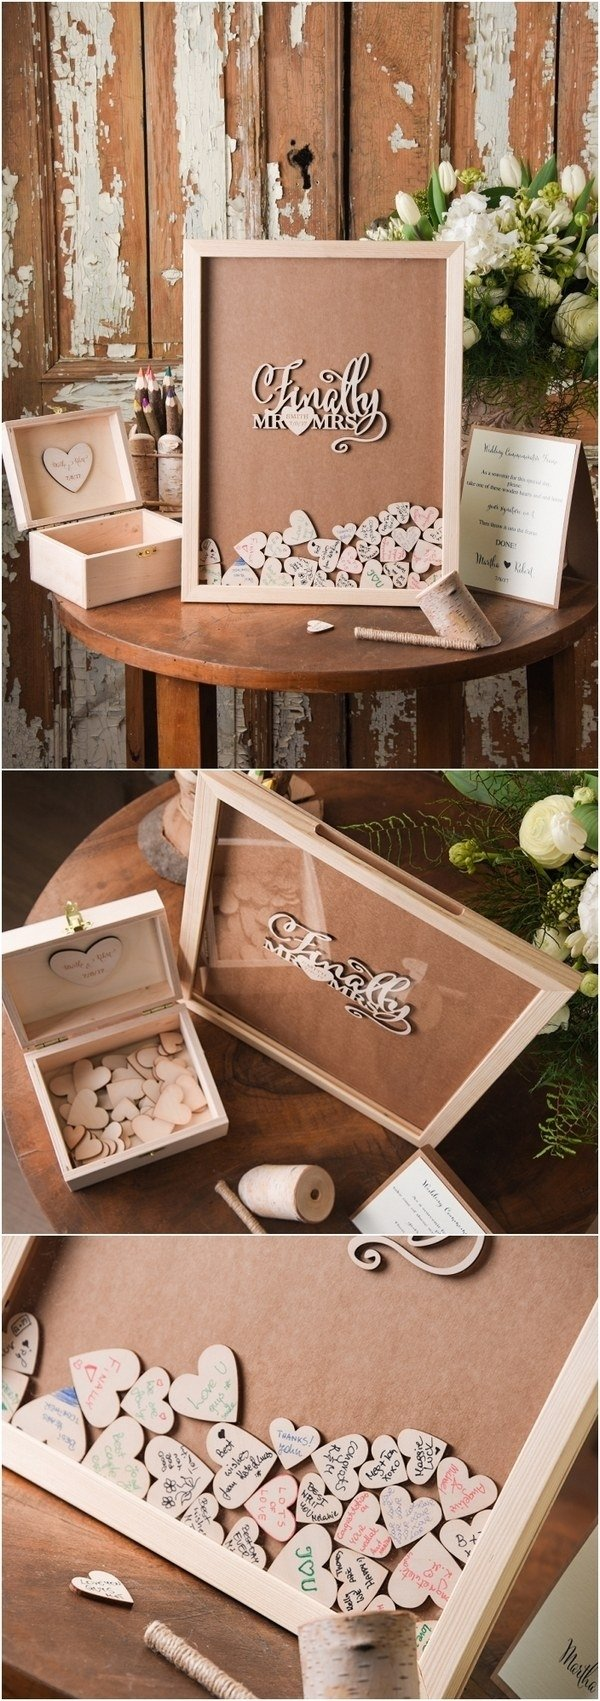 10 Cute Rustic Wedding Guest Book Ideas top 12 rustic wedding guest books botanical wedding invitations 4 1 2020